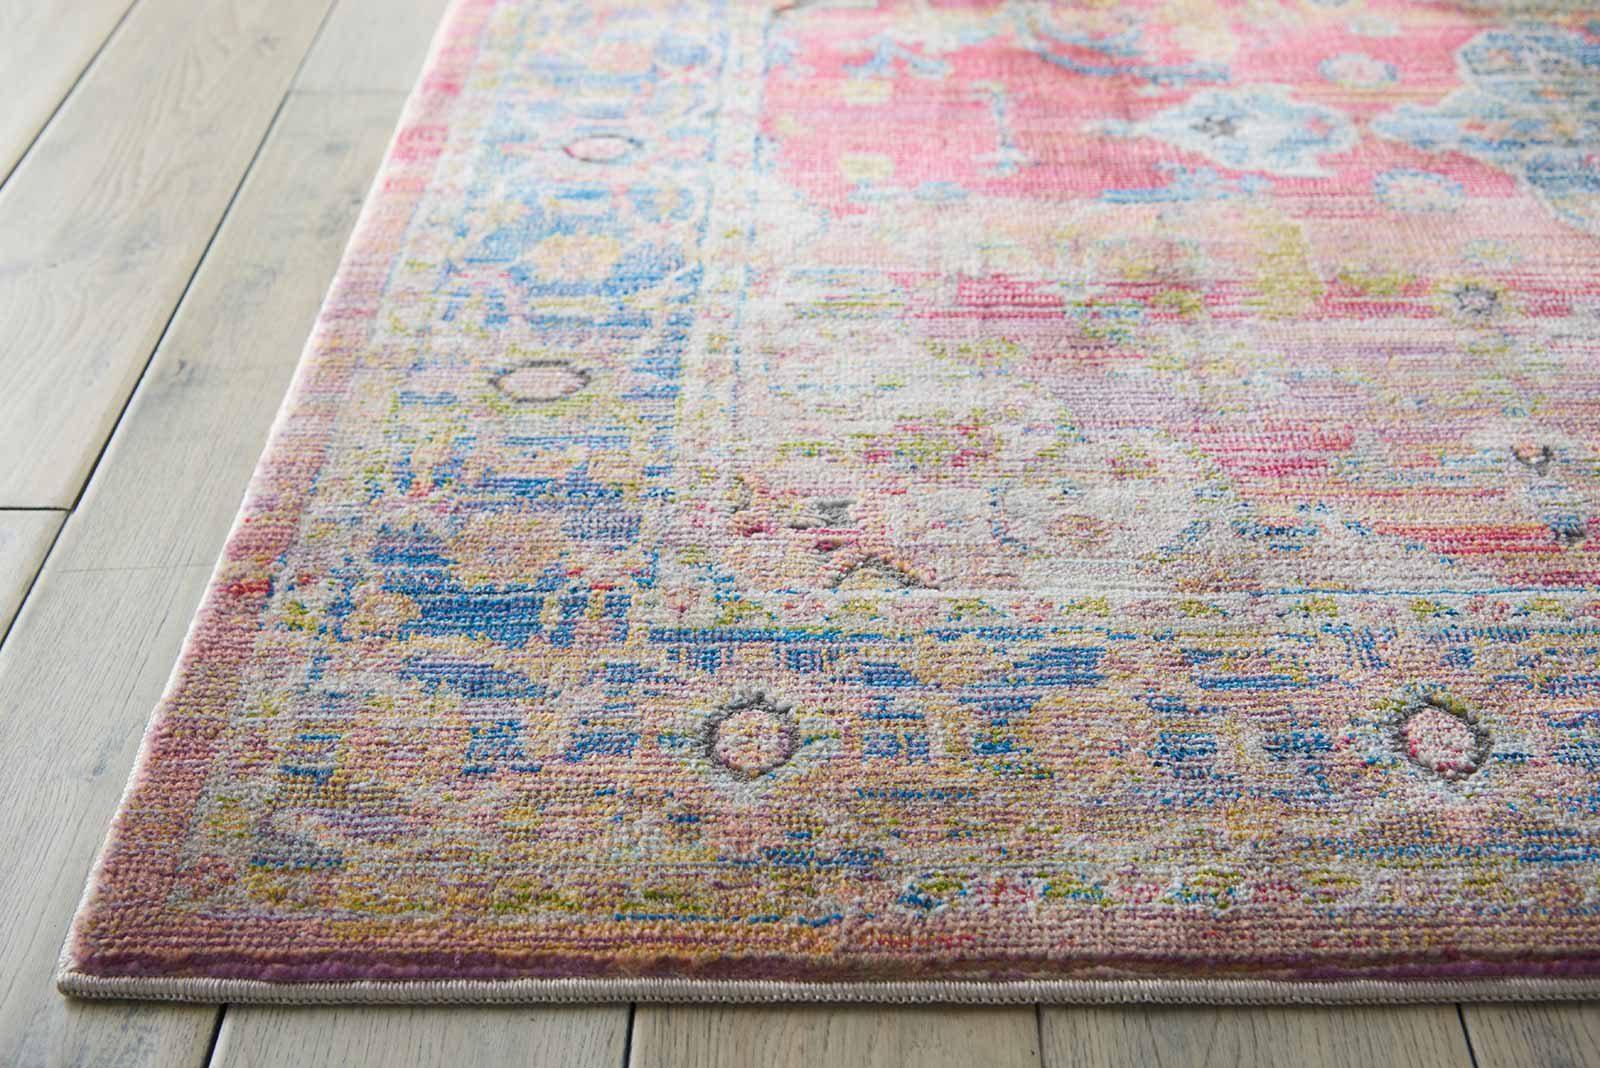 Andessi tapijt Ankara Global ANR01 MULTI 5x8 099446456335 DT01